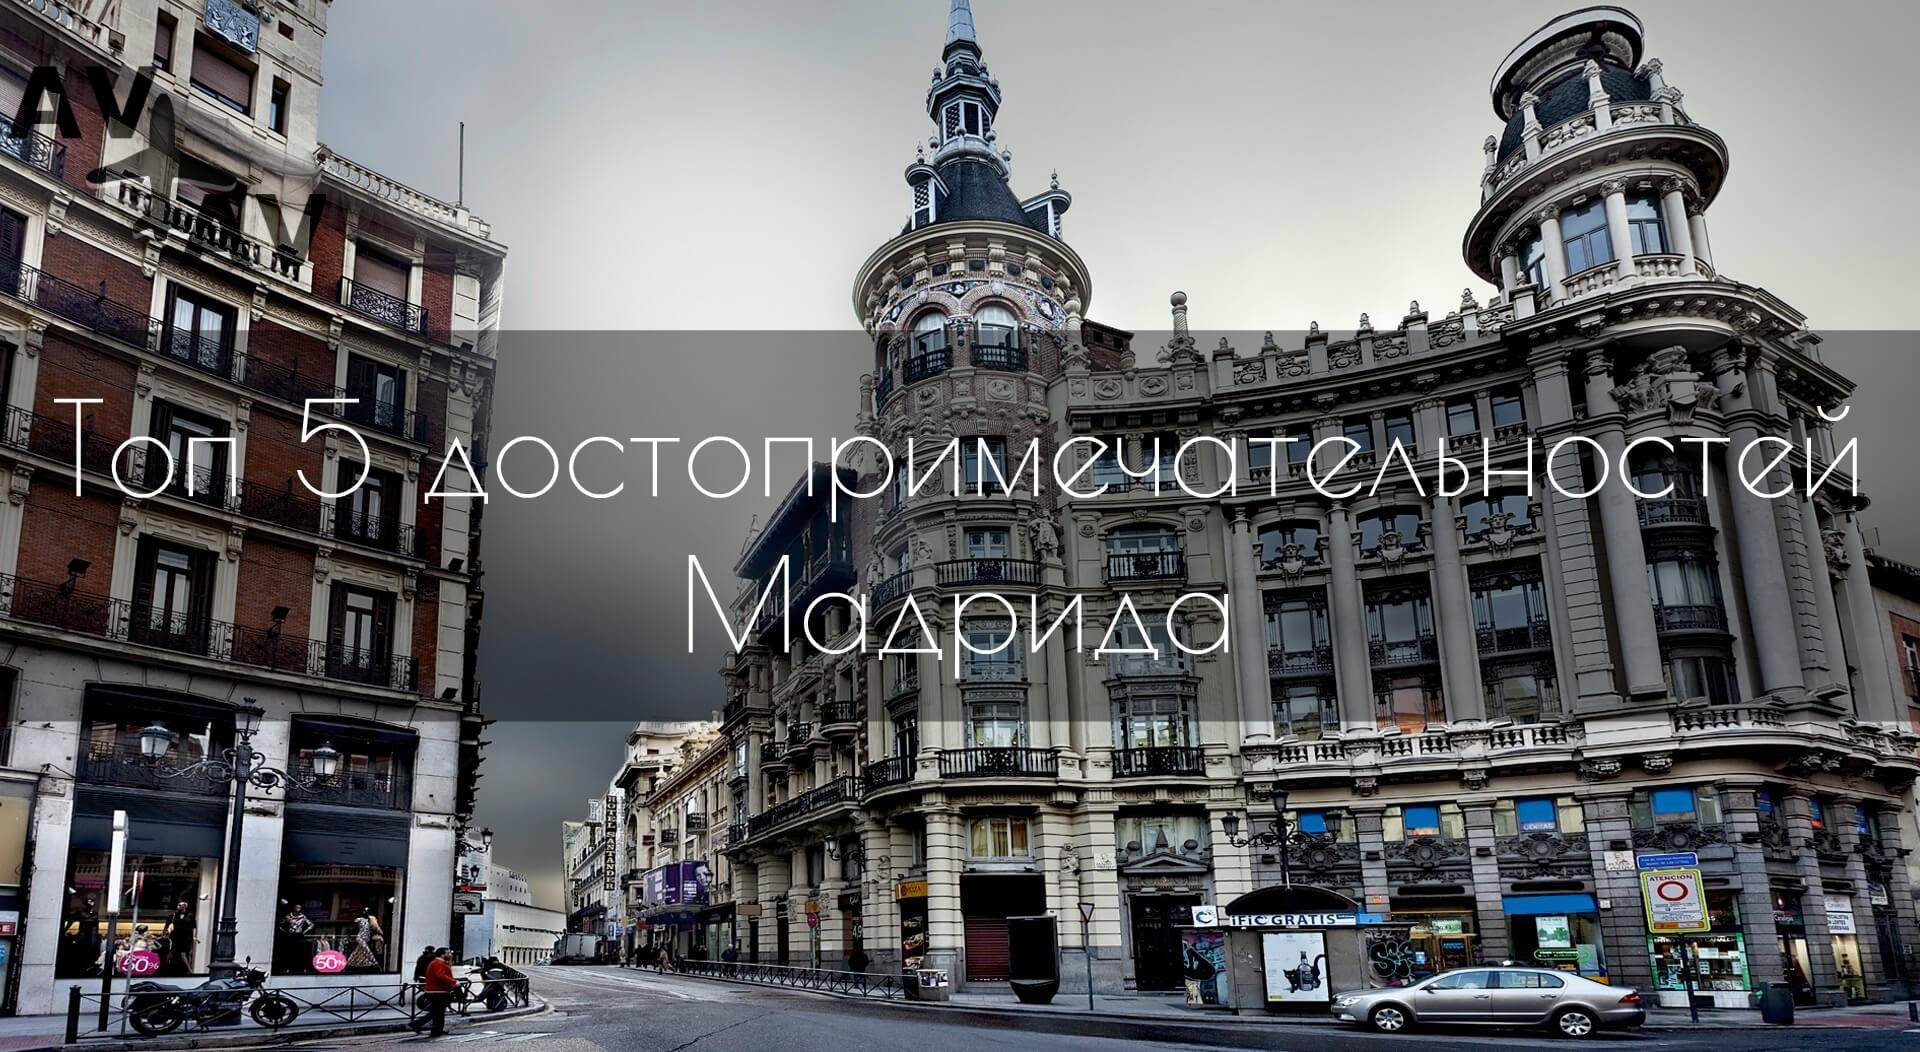 Dostoprimechatelnosti Madrida - Достопримечательности Мадрида